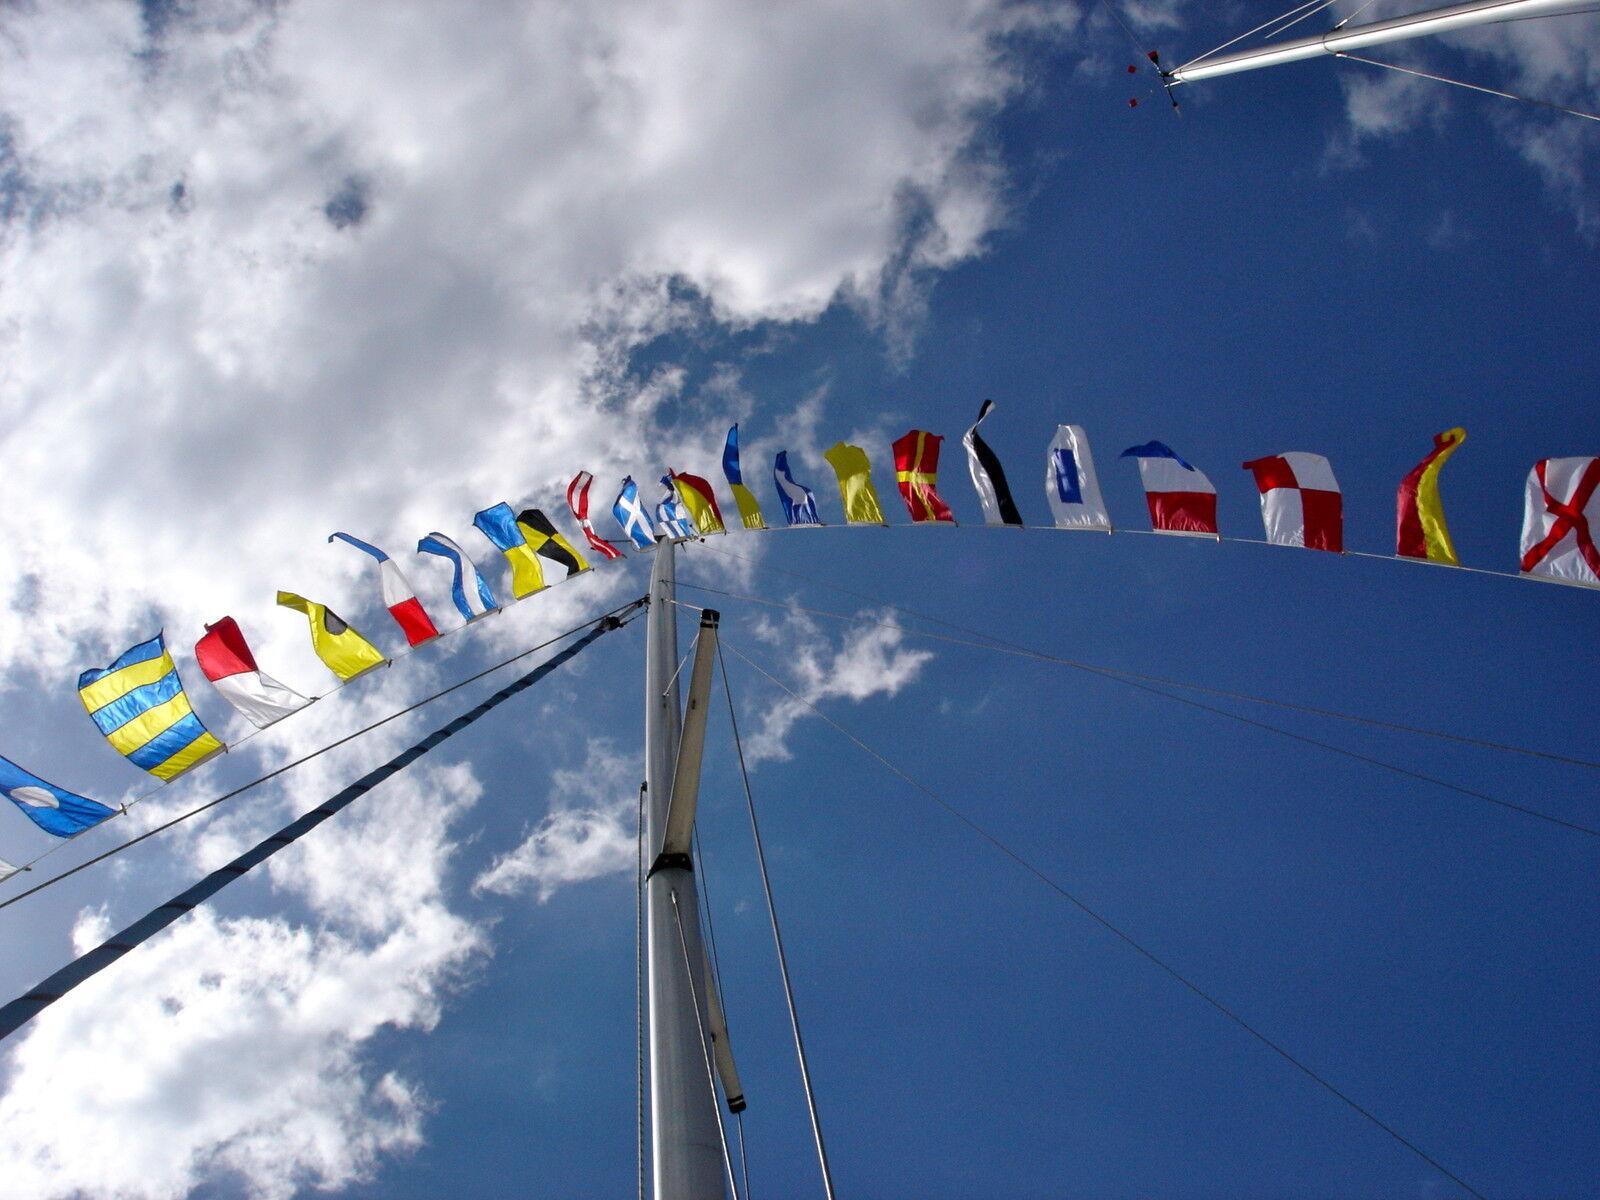 Signalflaggen Satz Watzki 45x35cm Internationales Flaggenalphabet neu OVP 45x28m